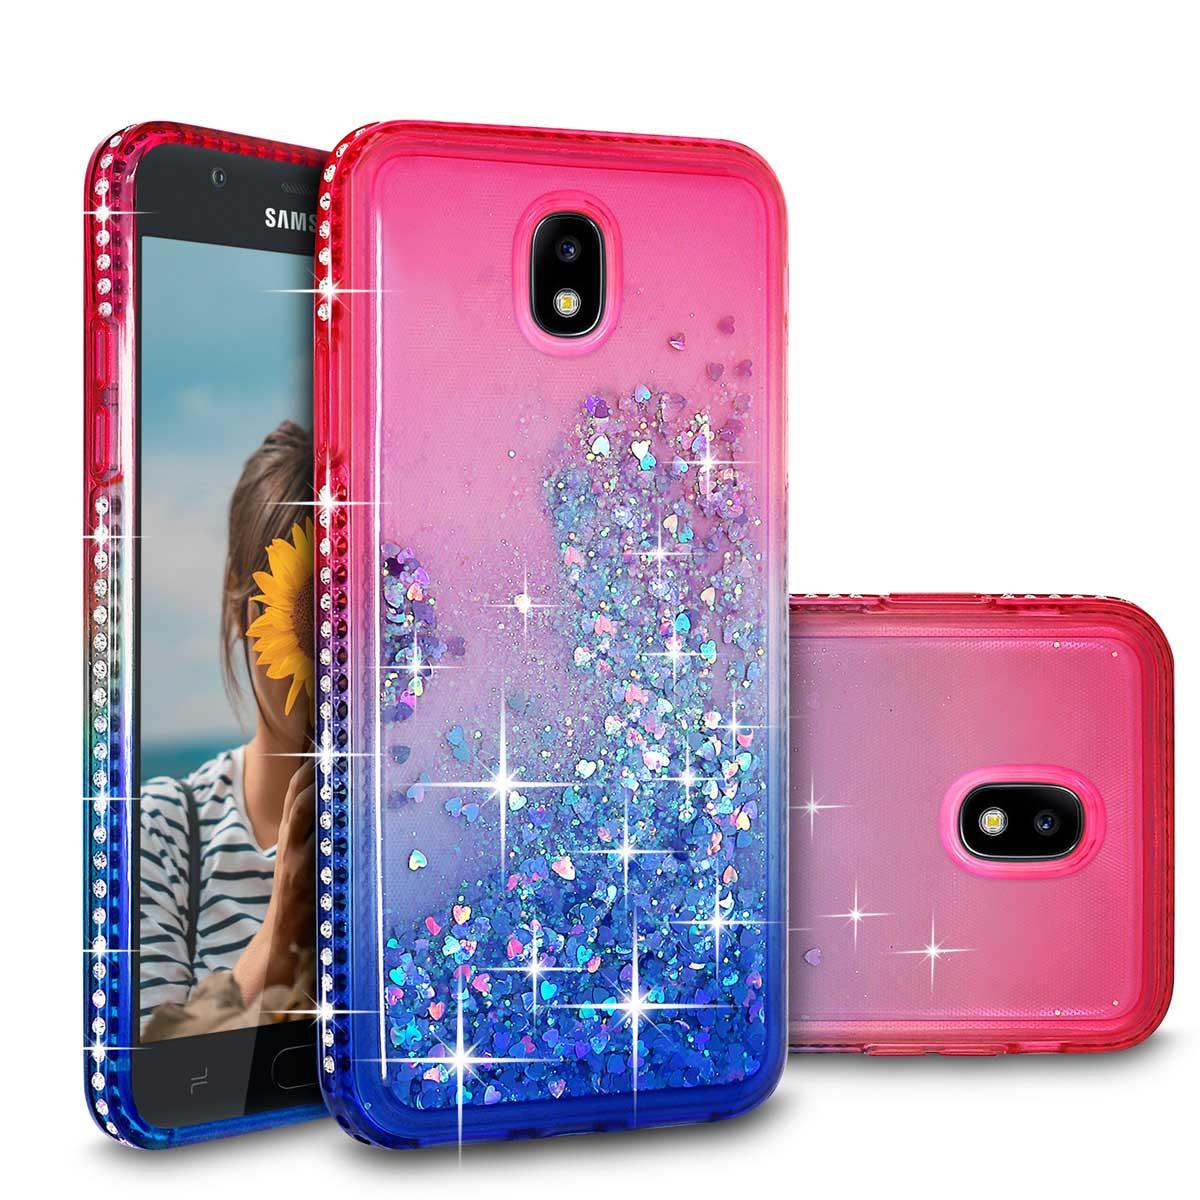 Ziva Wireless Inc | For Samsung Galaxy J3 2018 / Amp Prime 3